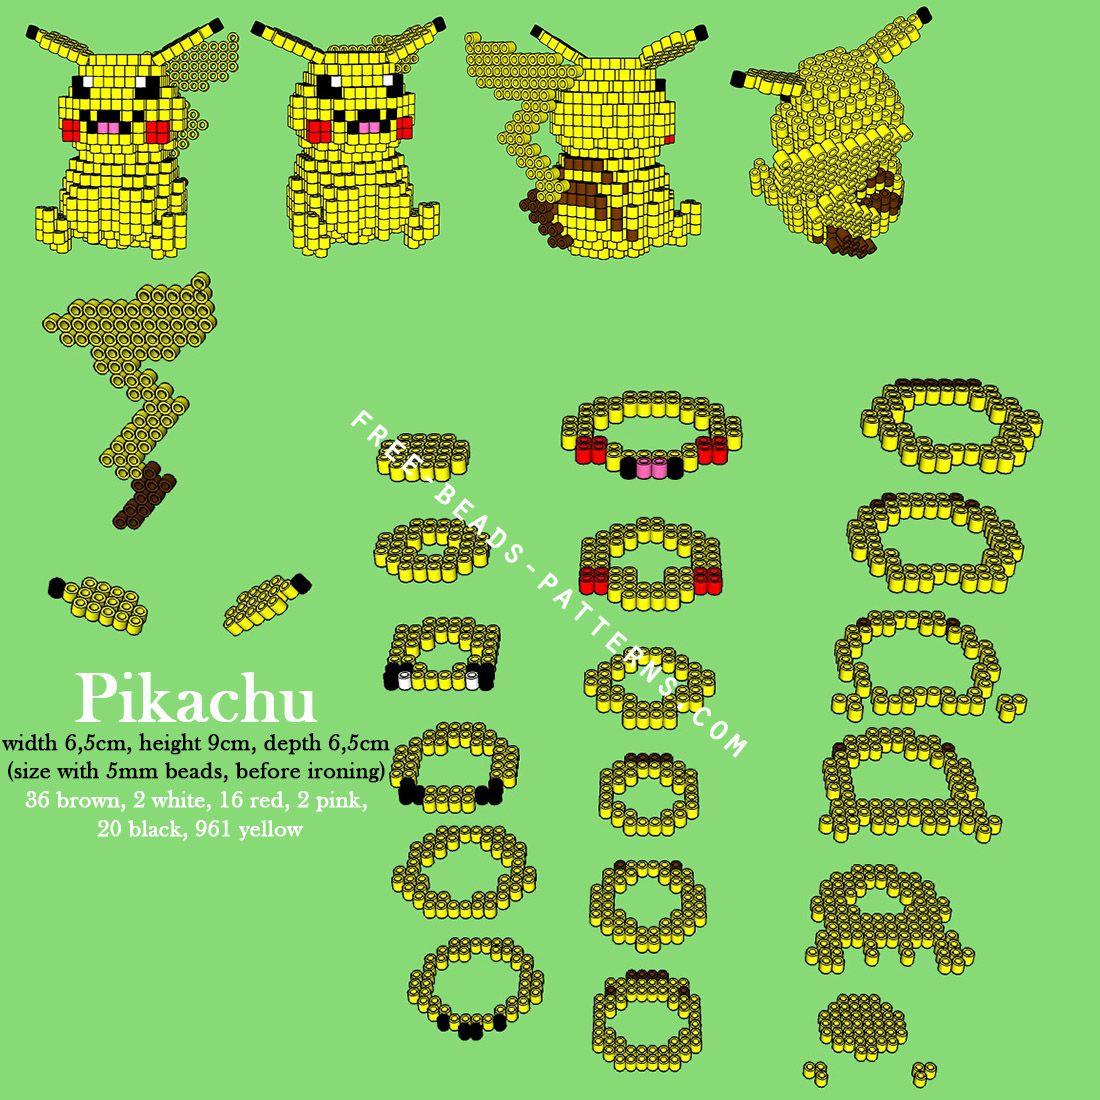 Pikachu Pokemon 3D Perler Beads Hama Beads Pyssla free